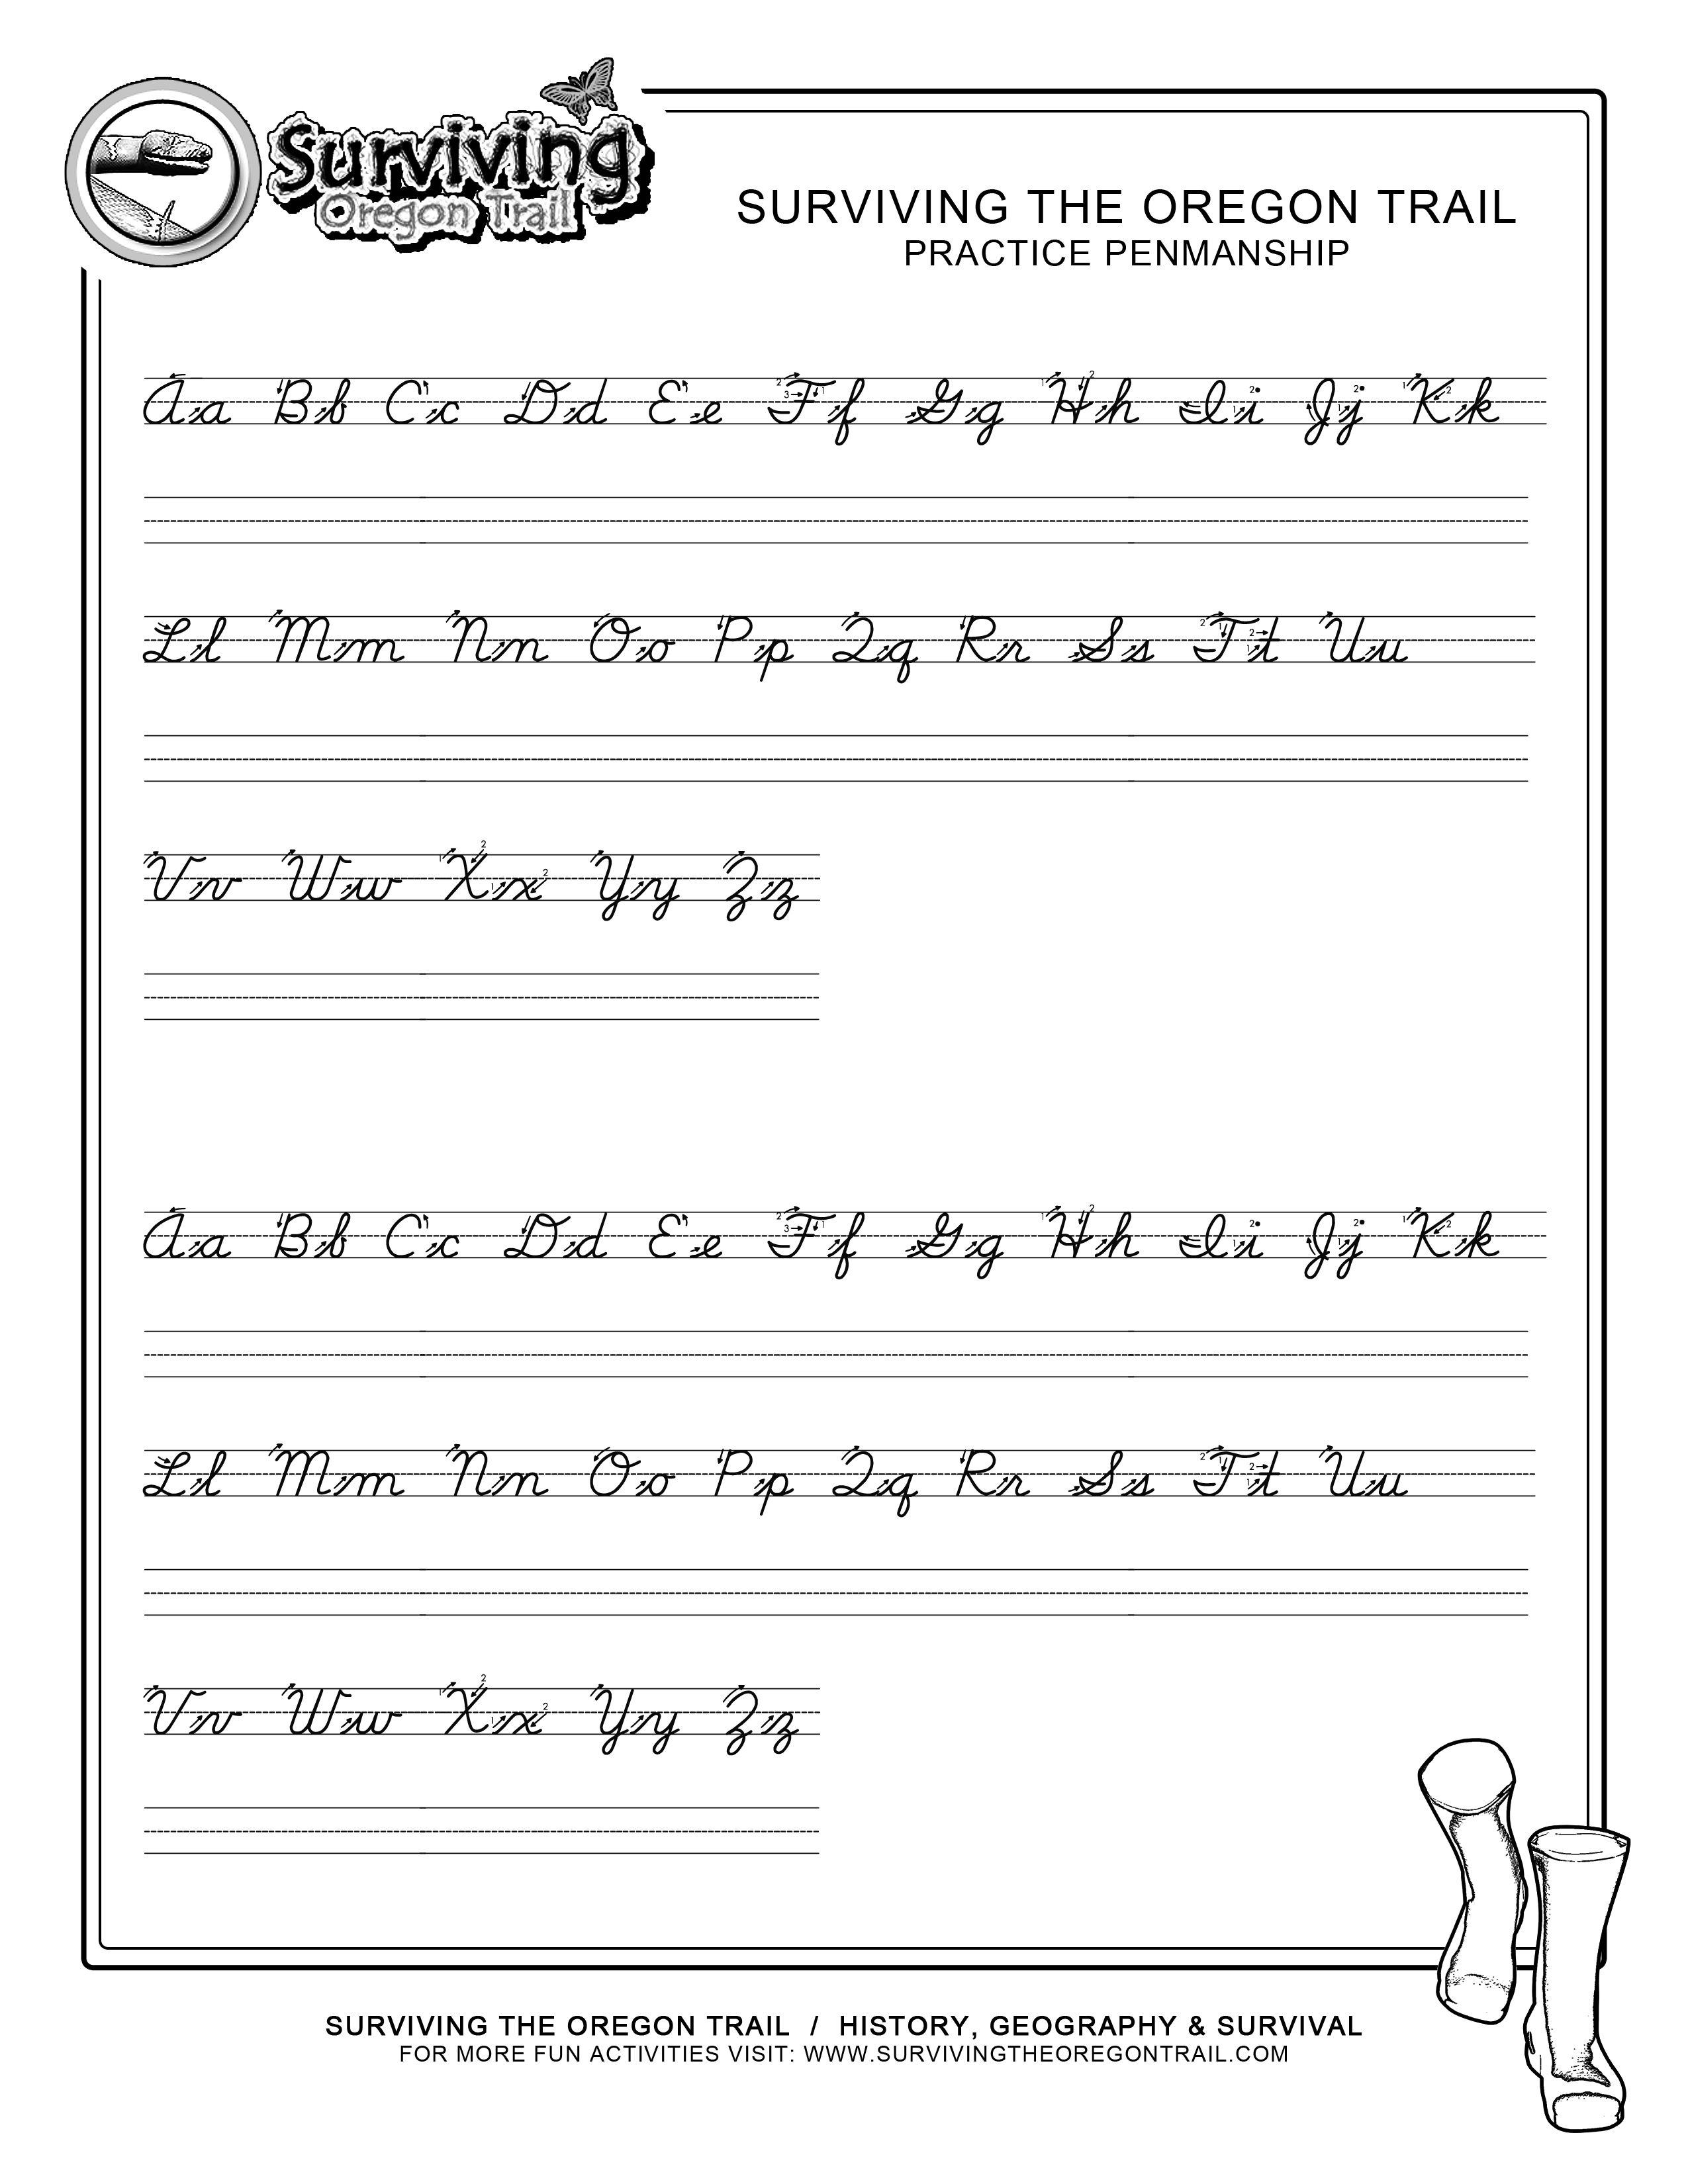 Practice Penmanship – Free Abc's Printable Cursive Writing Worksheet | Printable Cursive Handwriting Worksheets Alphabet